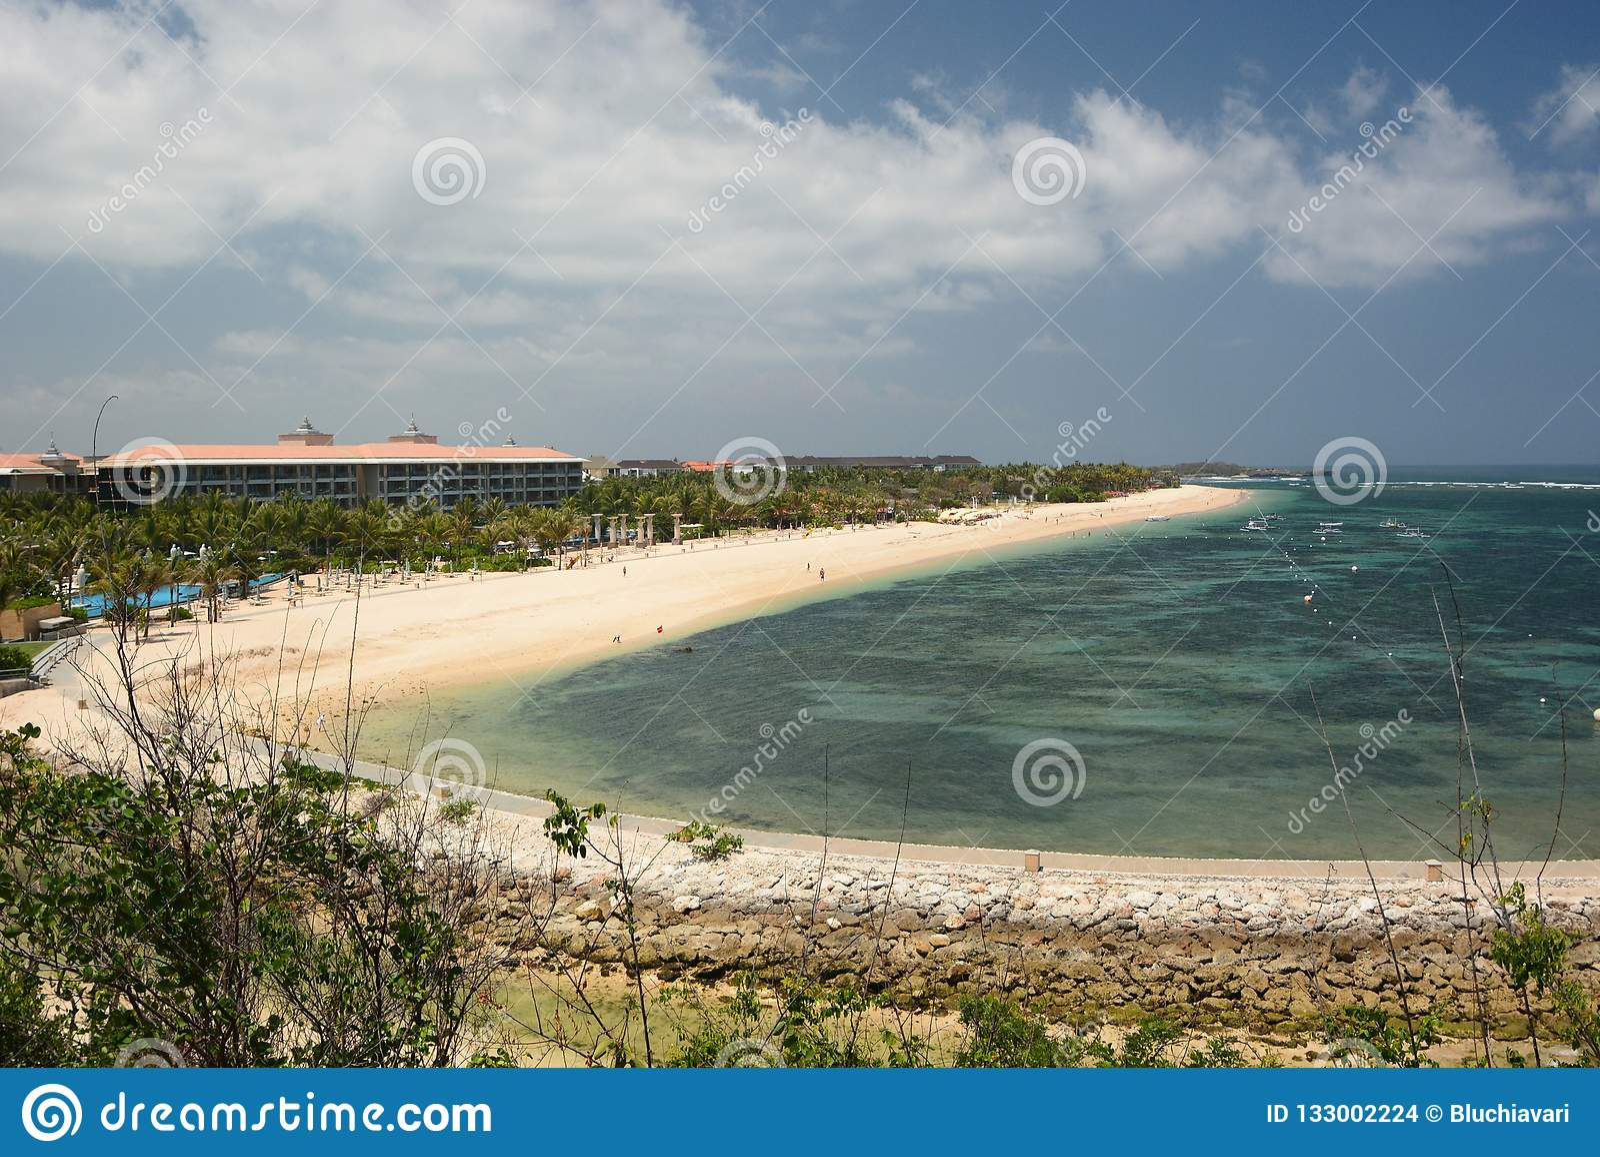 The Beach Nusa Dua Bali Indonesia Stock Photo Image Of